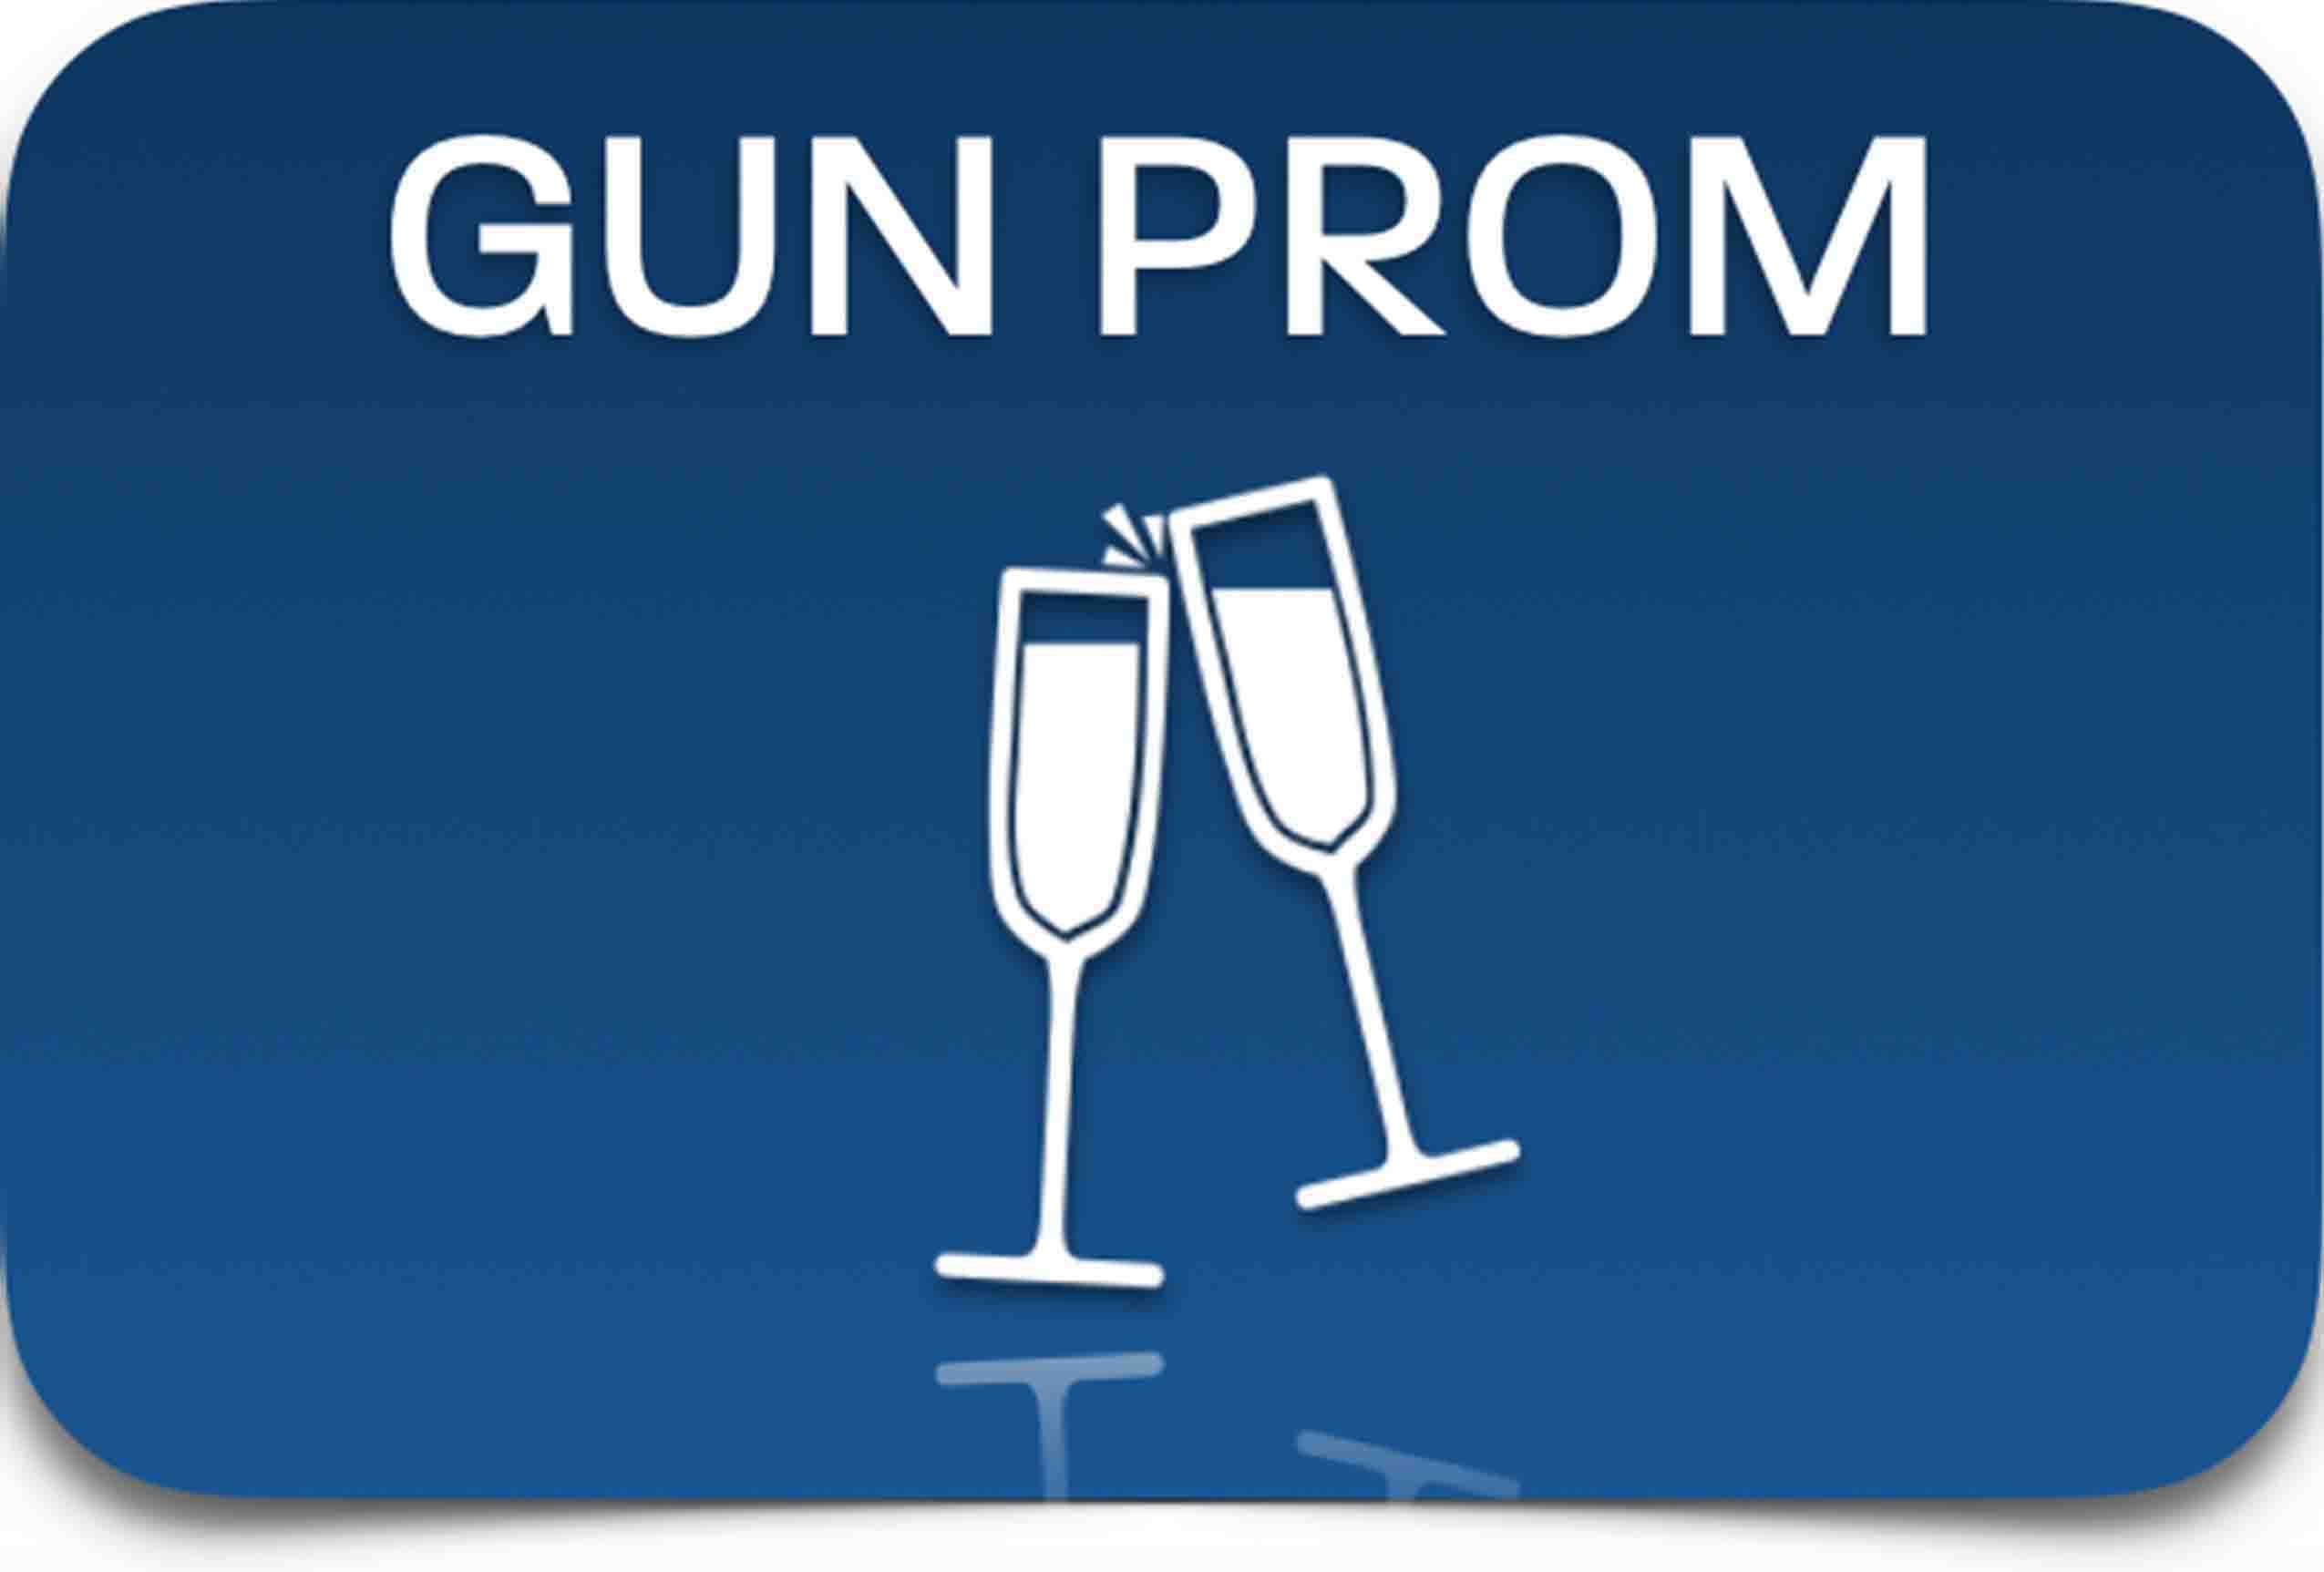 Gun_Prom